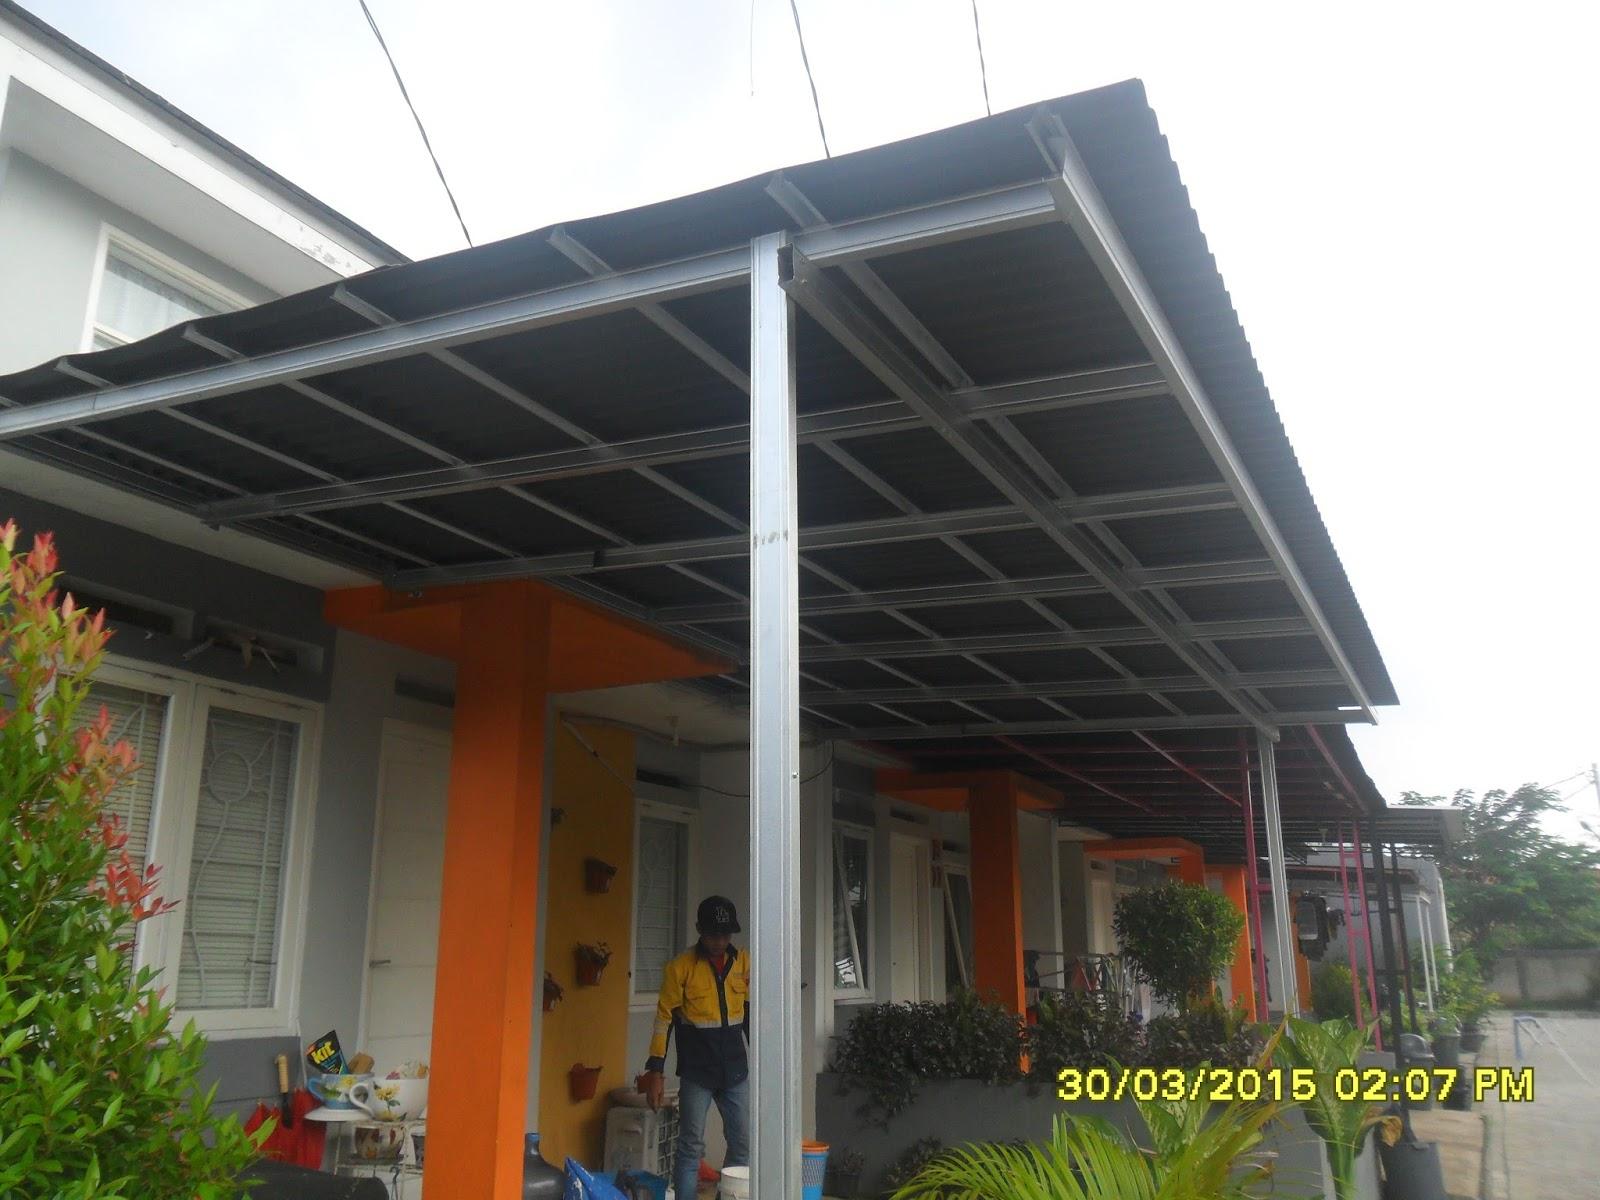 Kanopi Baja Ringan Tangerang Jasa Pembuatan 08118700799